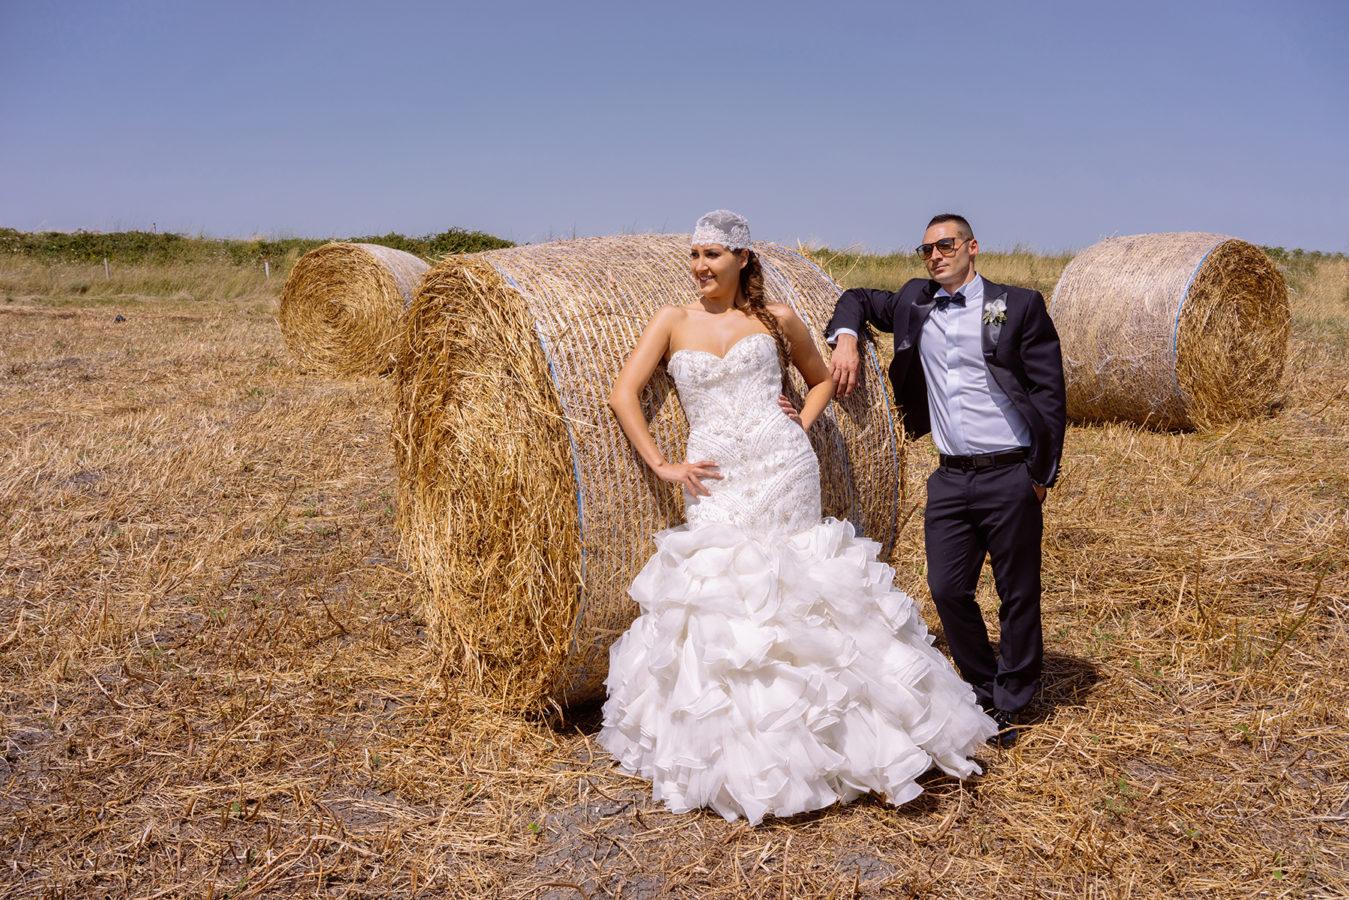 016296 Roberta & Stefano